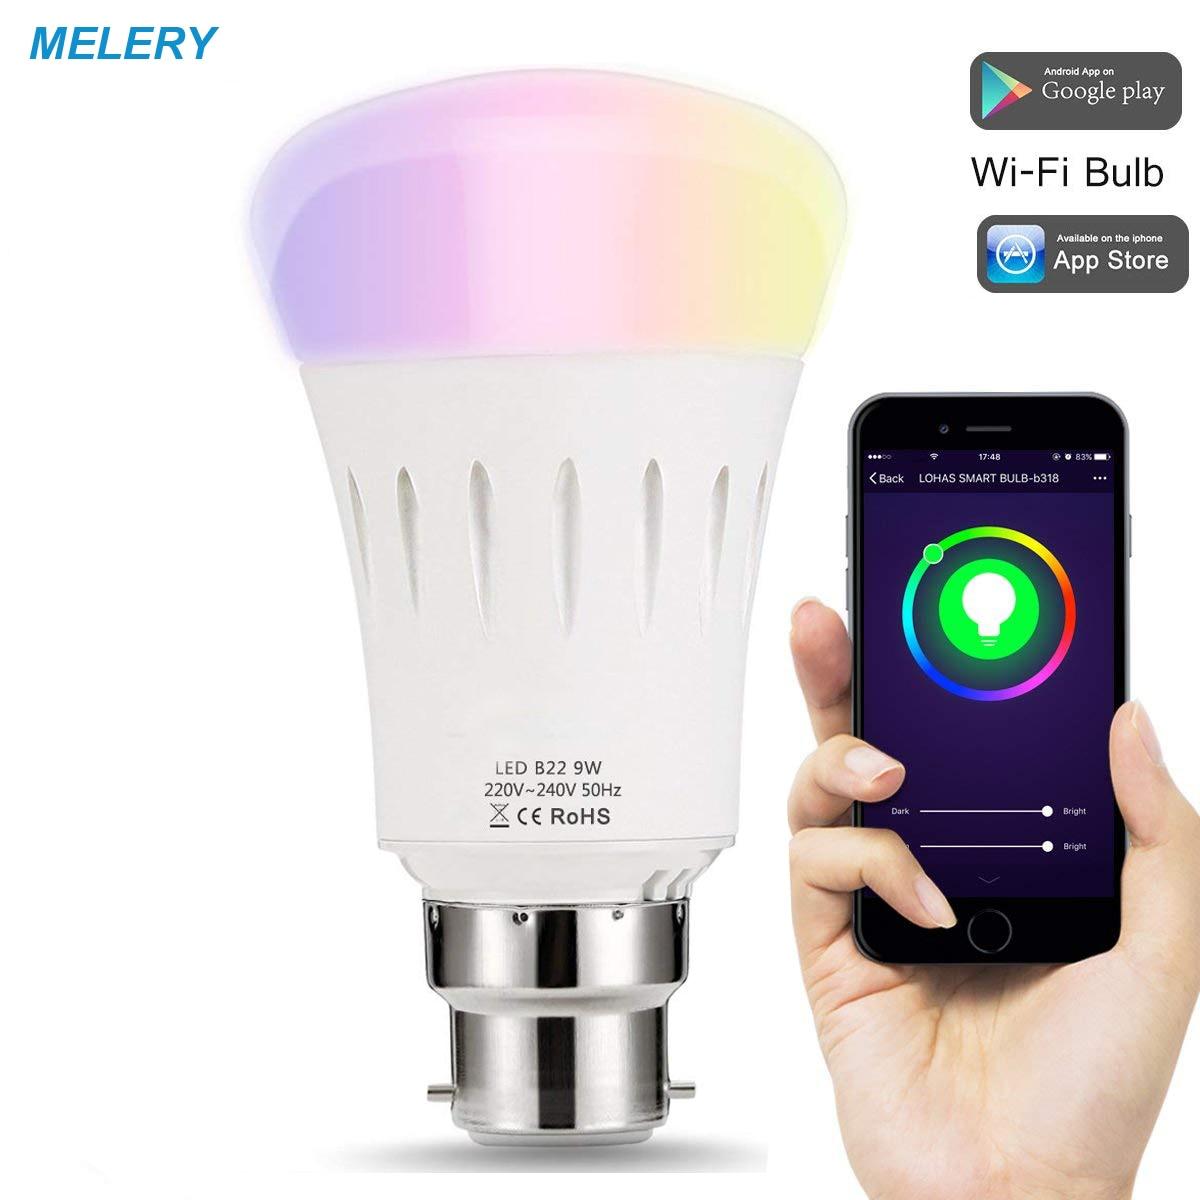 Bombilla inteligente LED WiFi B22 Luz de cambio de color 60W equivalente a control remoto Homekit funciona con Amazon Alexa Google Home,IFTTT